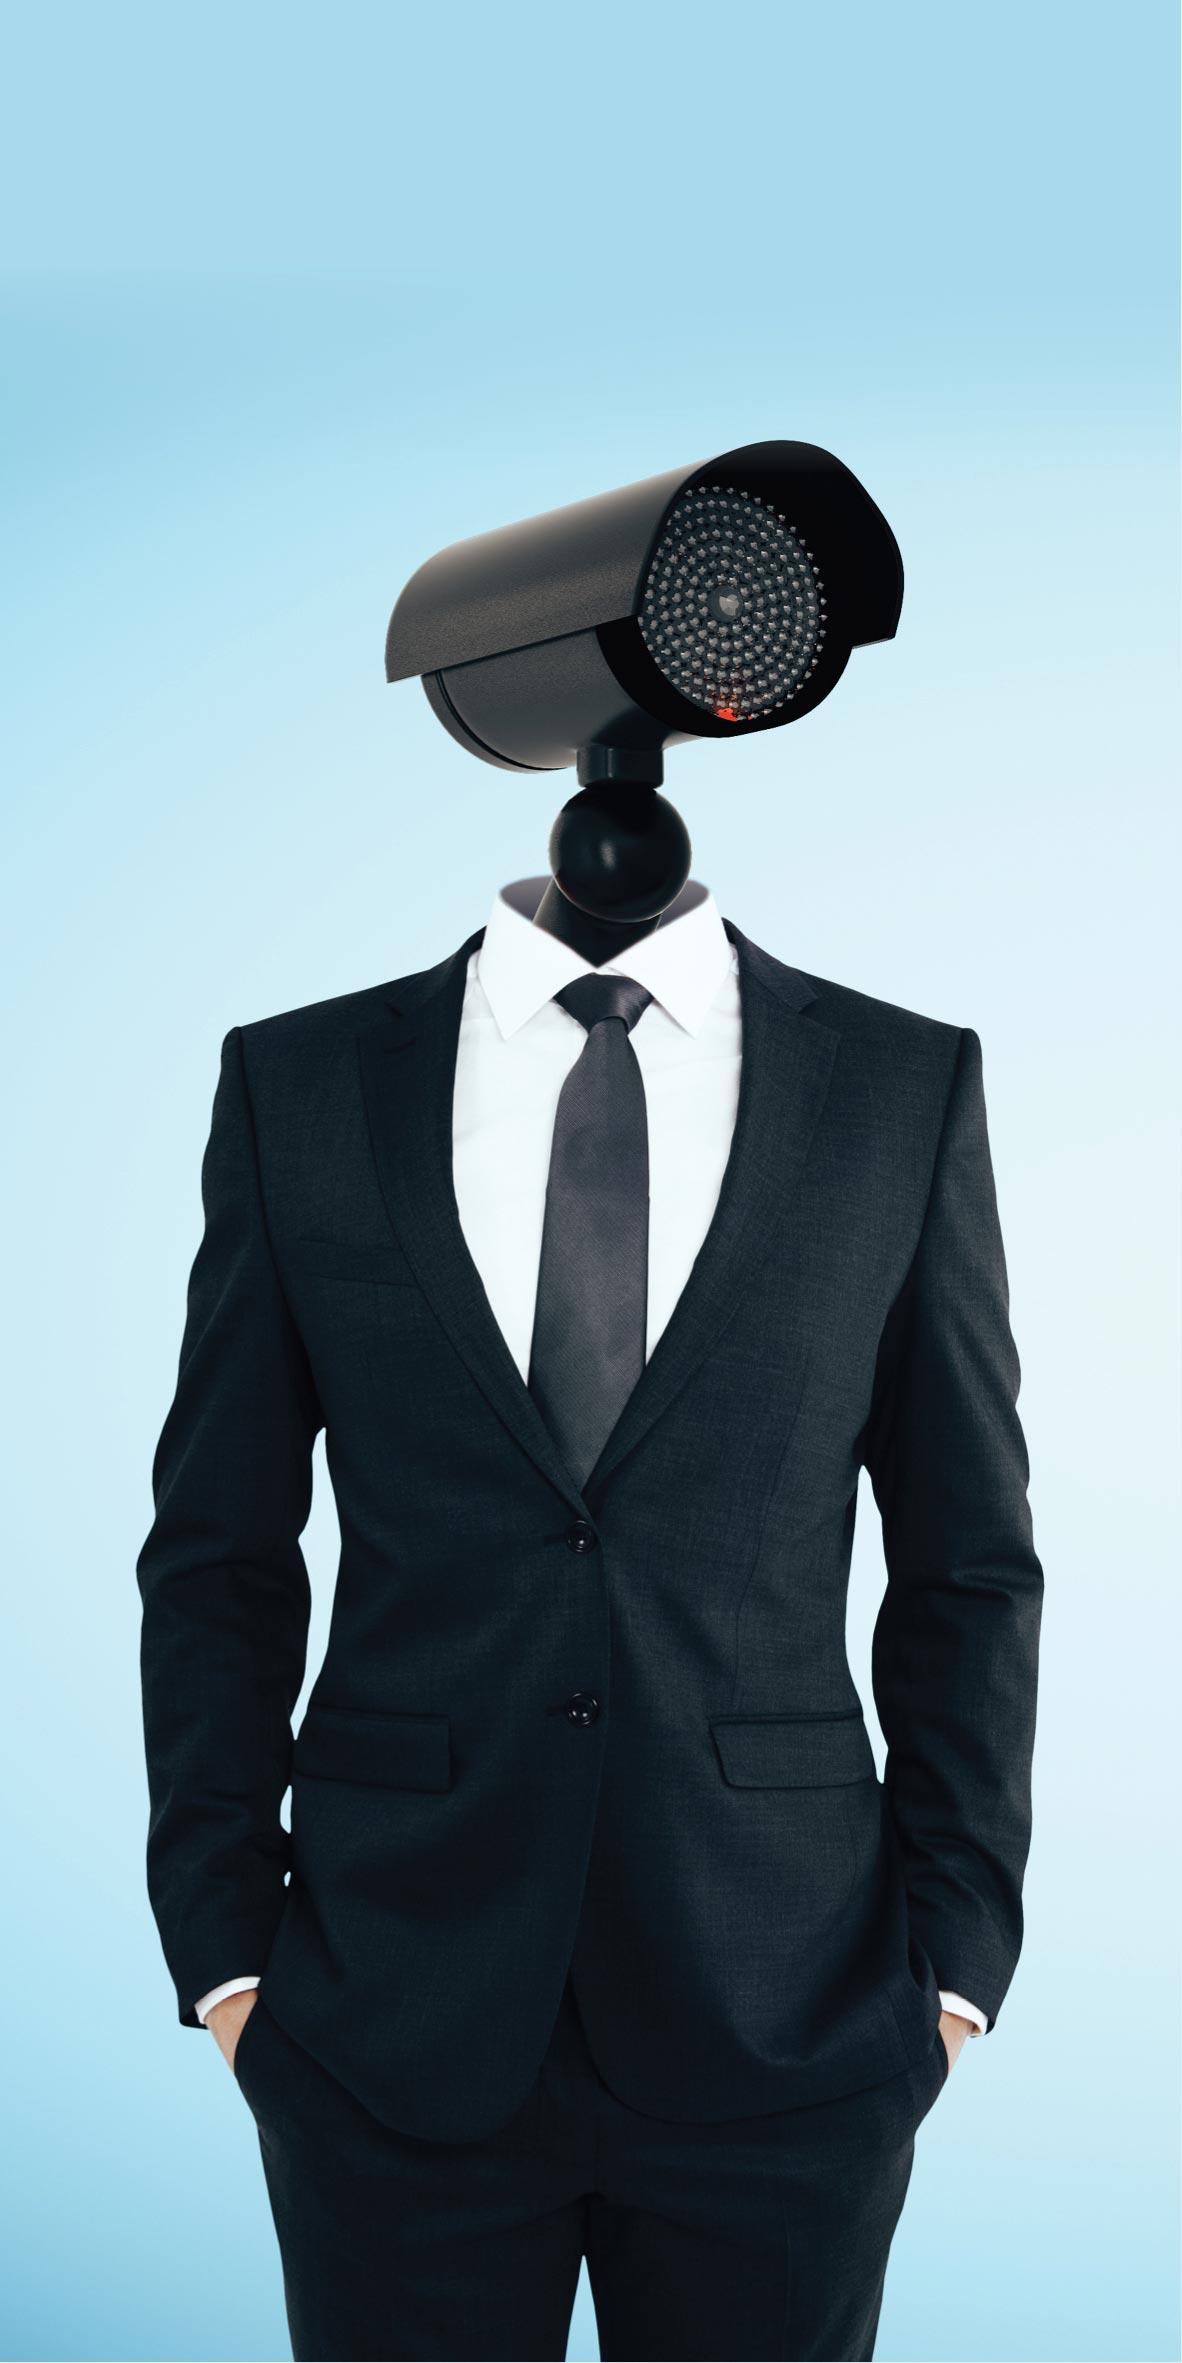 hommetechnologiecamera